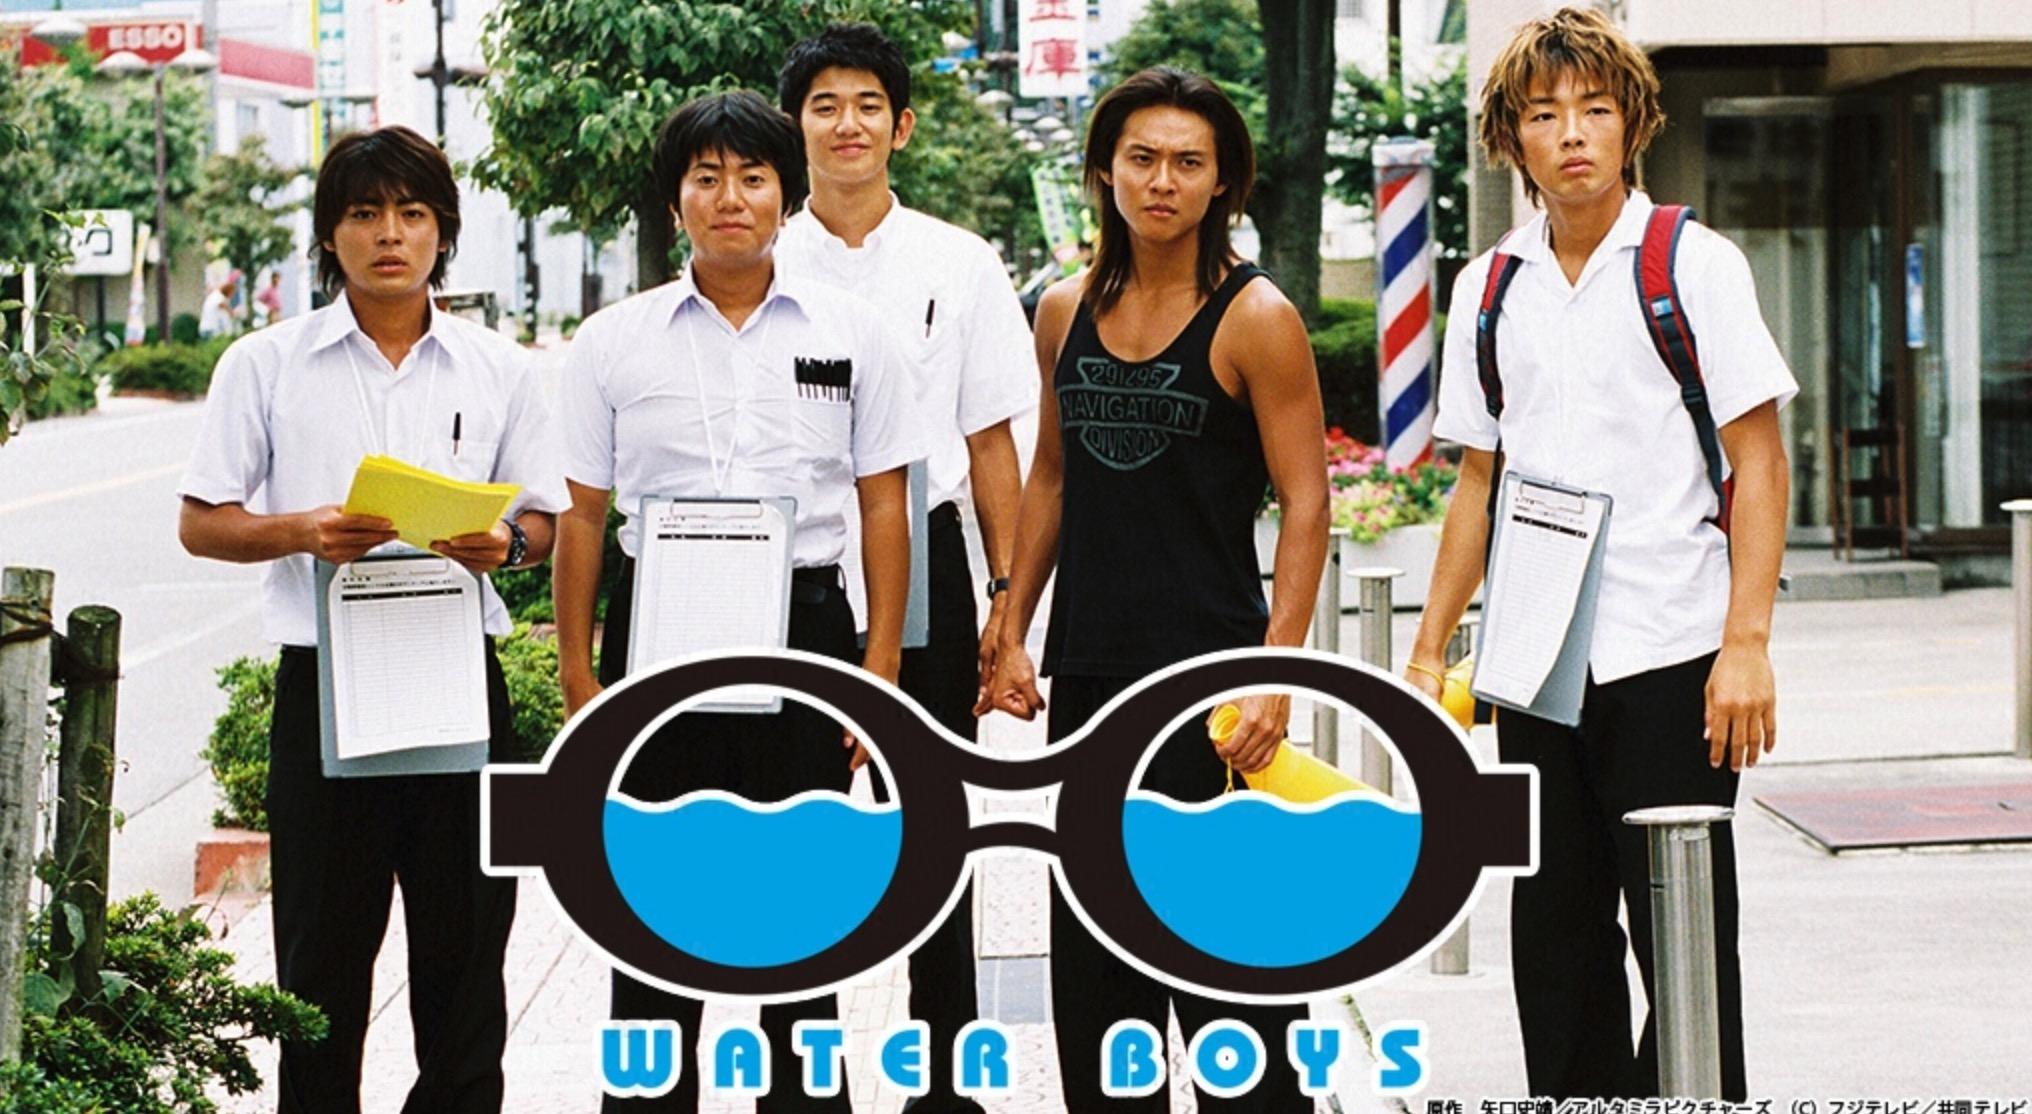 WATER BOYS(ウォーターボーイズ)